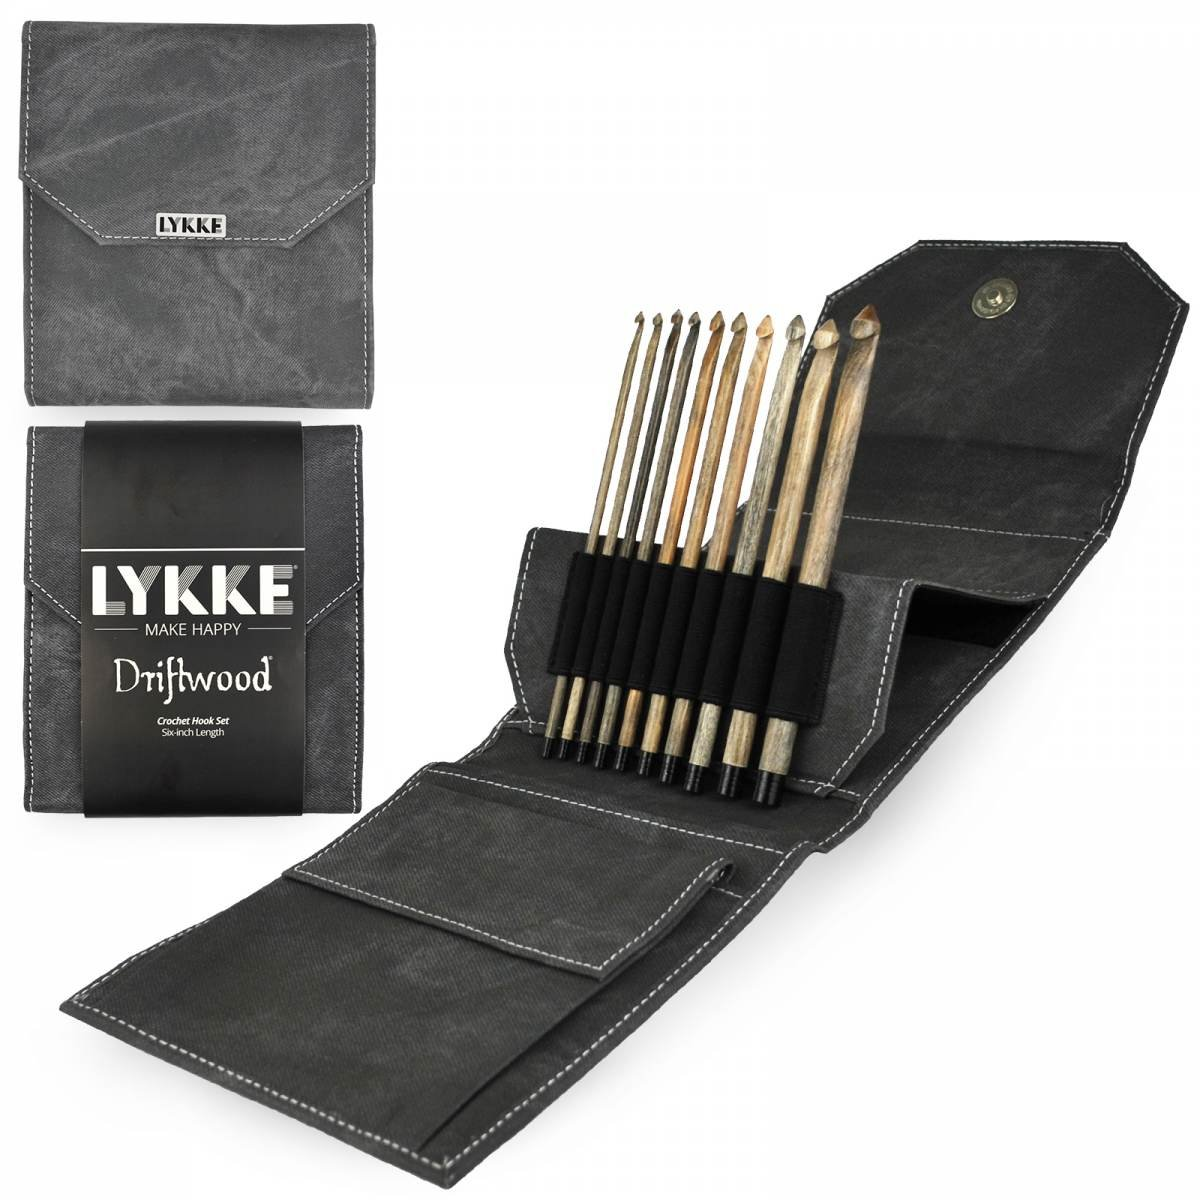 Lykke Driftwood 6 Crochet Hook Set - Grey Denim